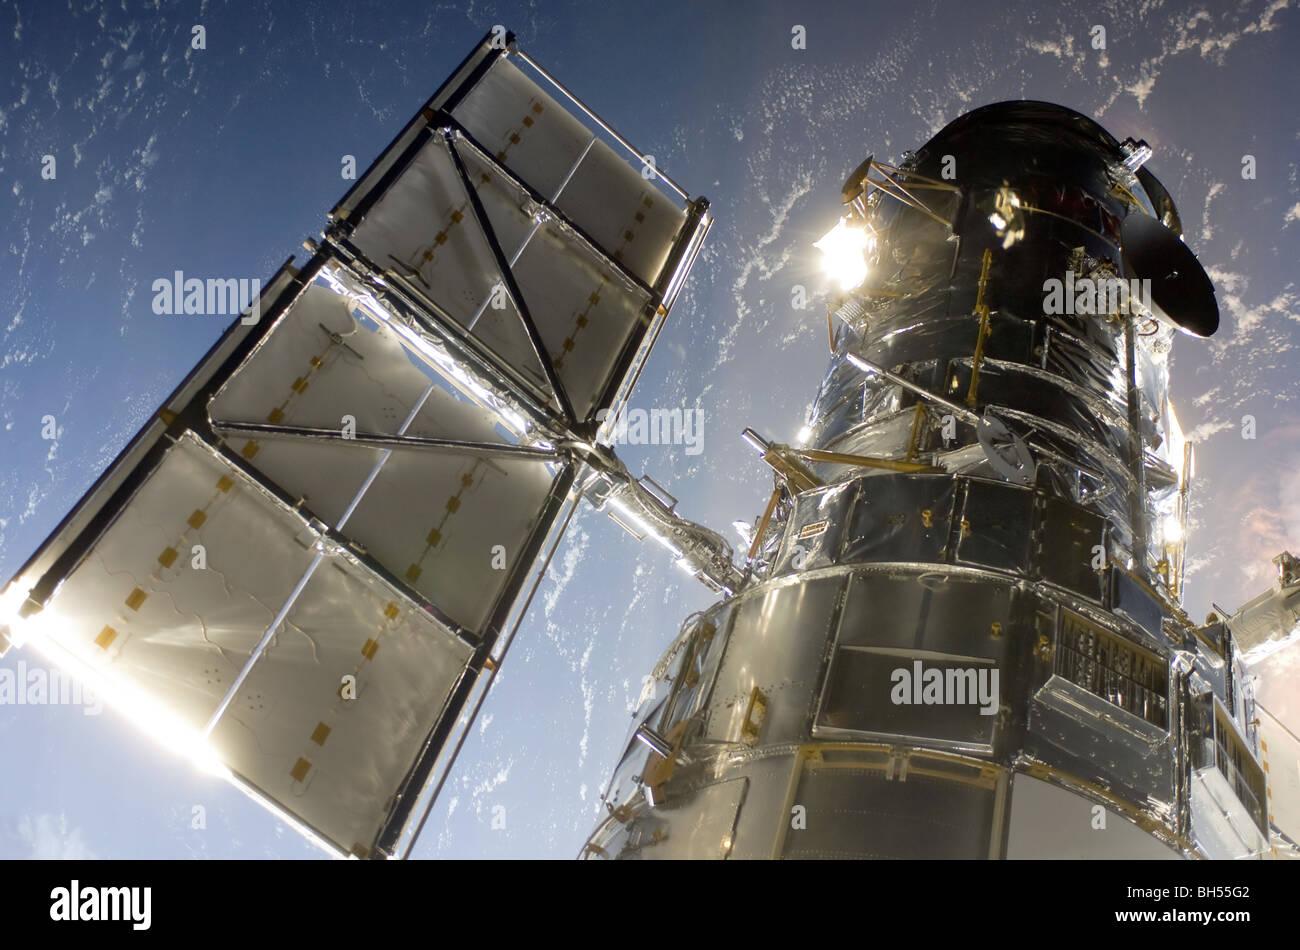 NASA Hubble Space Telescope above Earth - Stock Image